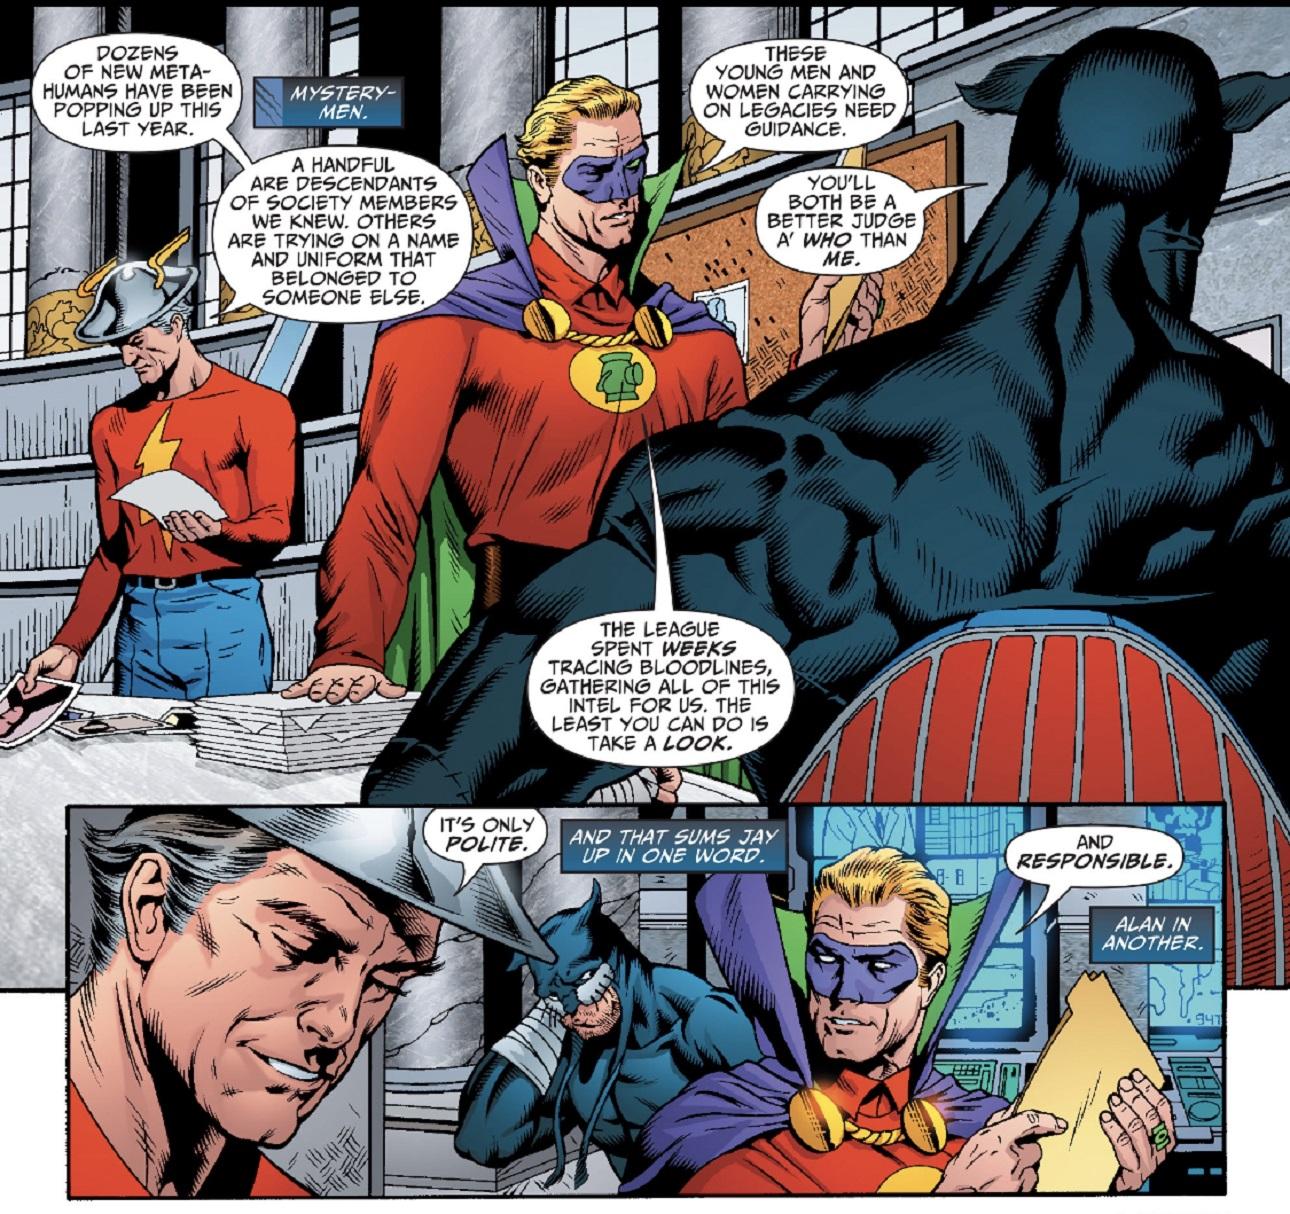 Justice-Society-Flash-Wildcat-Green-Lantern.jpg